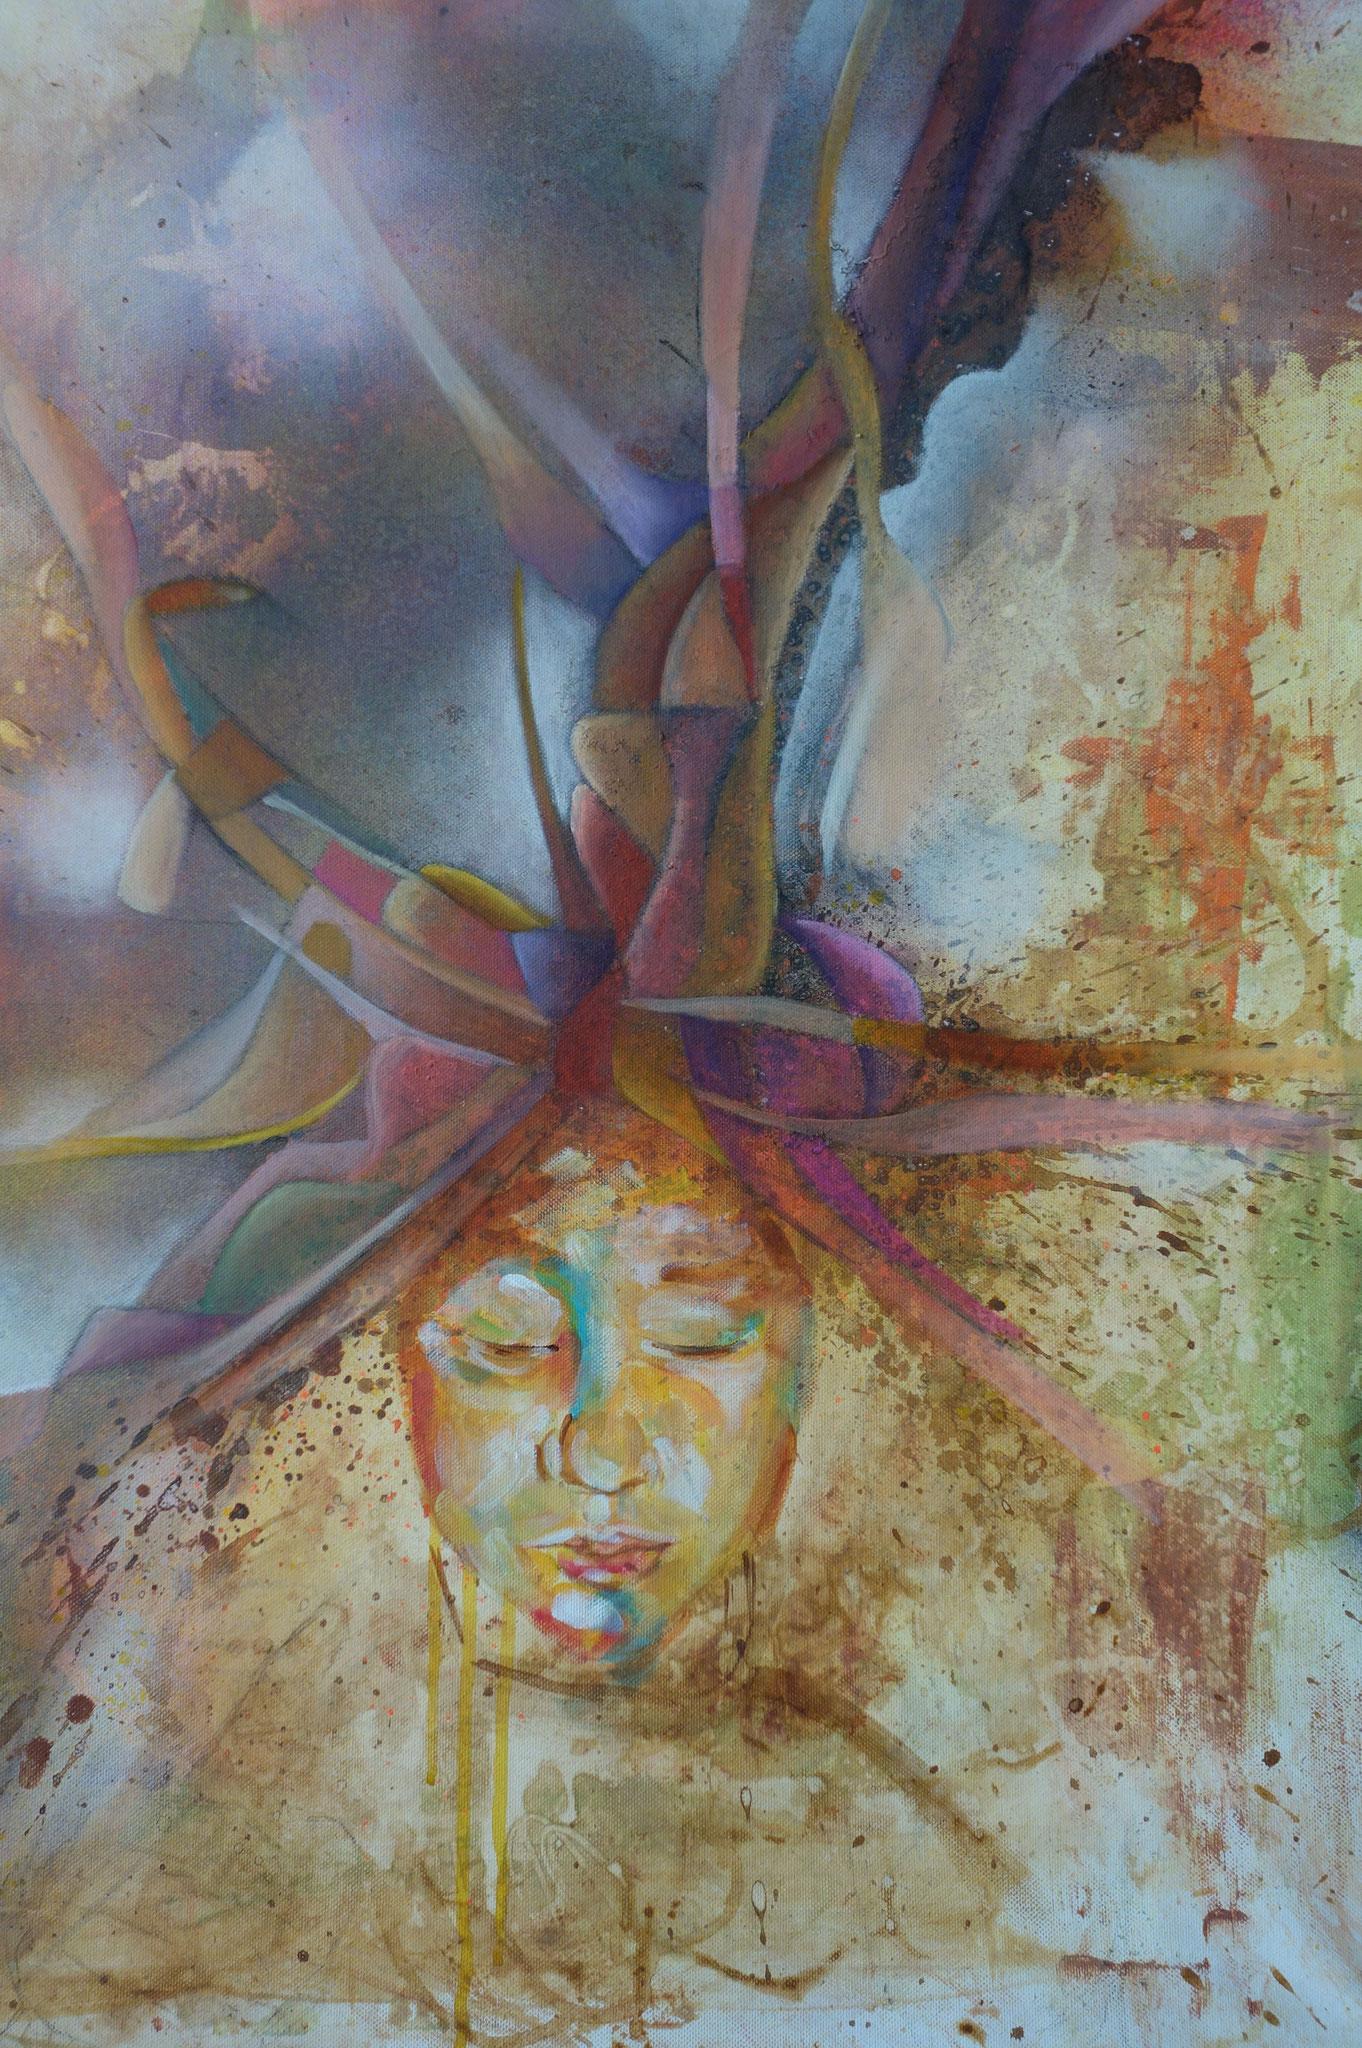 Colorful Dreams II, 2015, 60 x 80 cm, Acrylic on Canvas